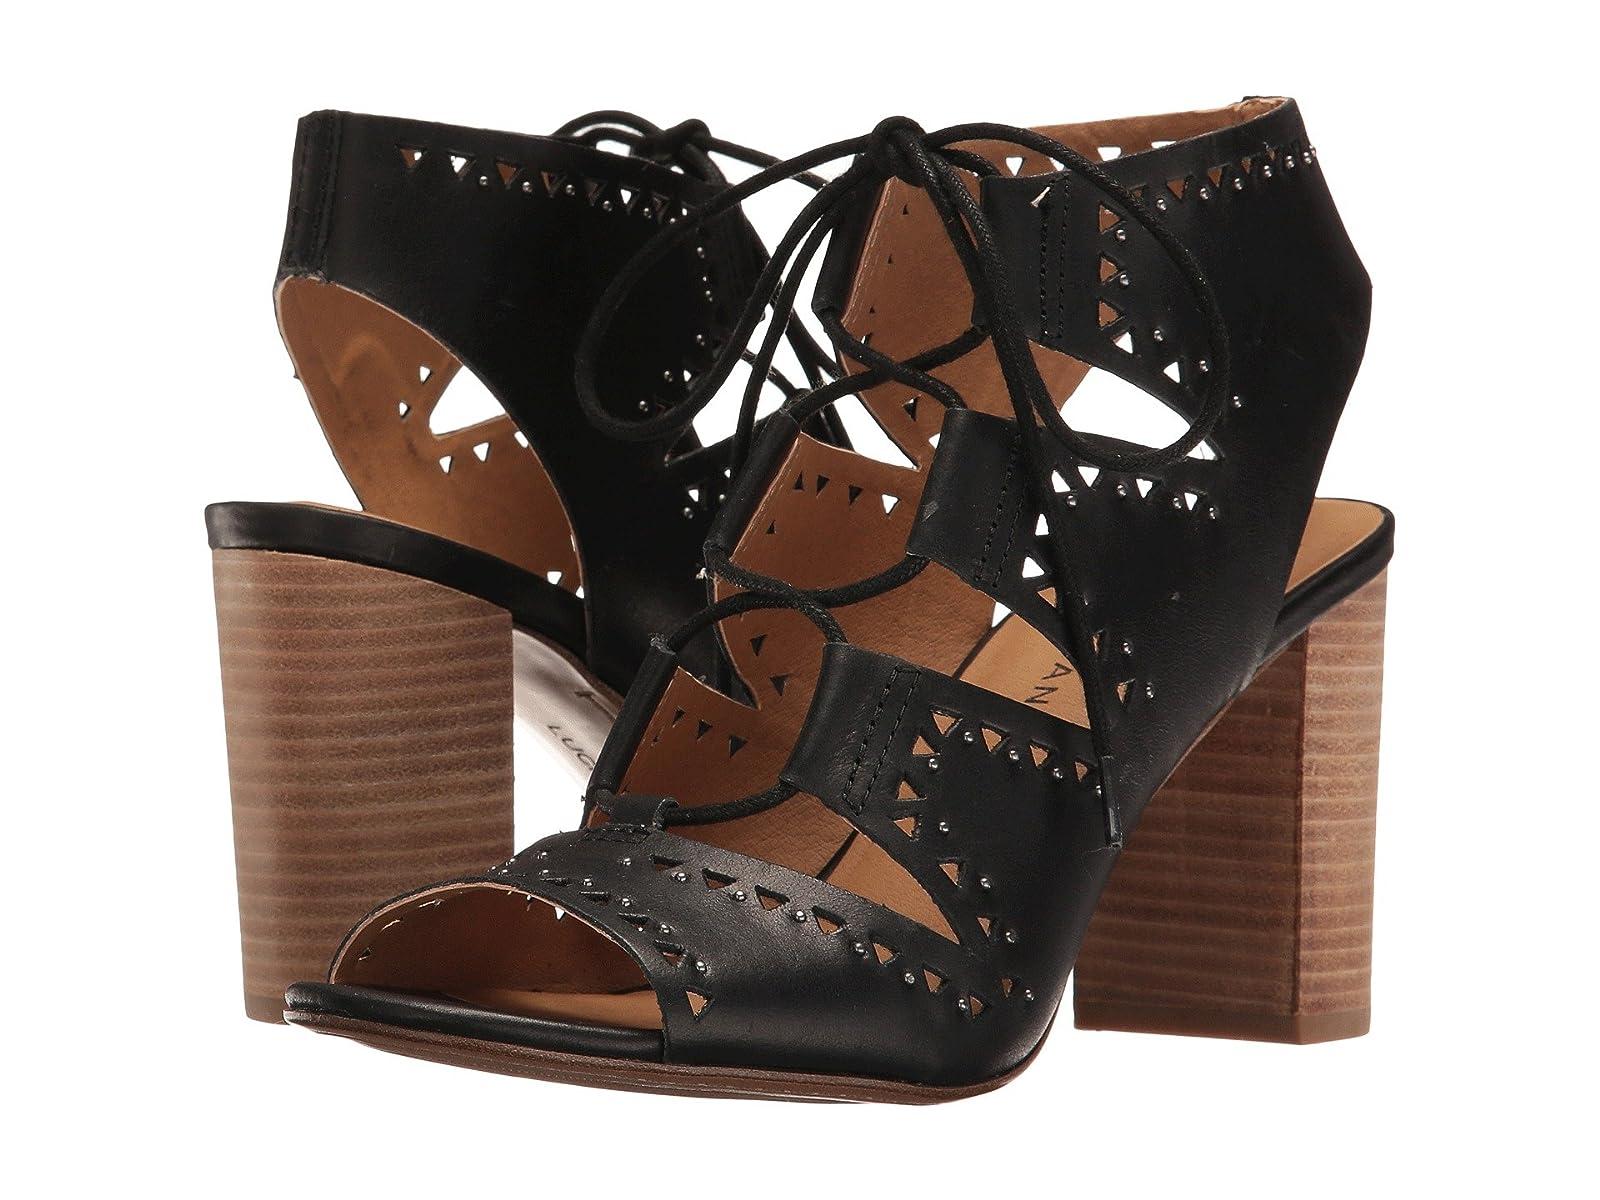 Lucky Brand TafiaCheap and distinctive eye-catching shoes